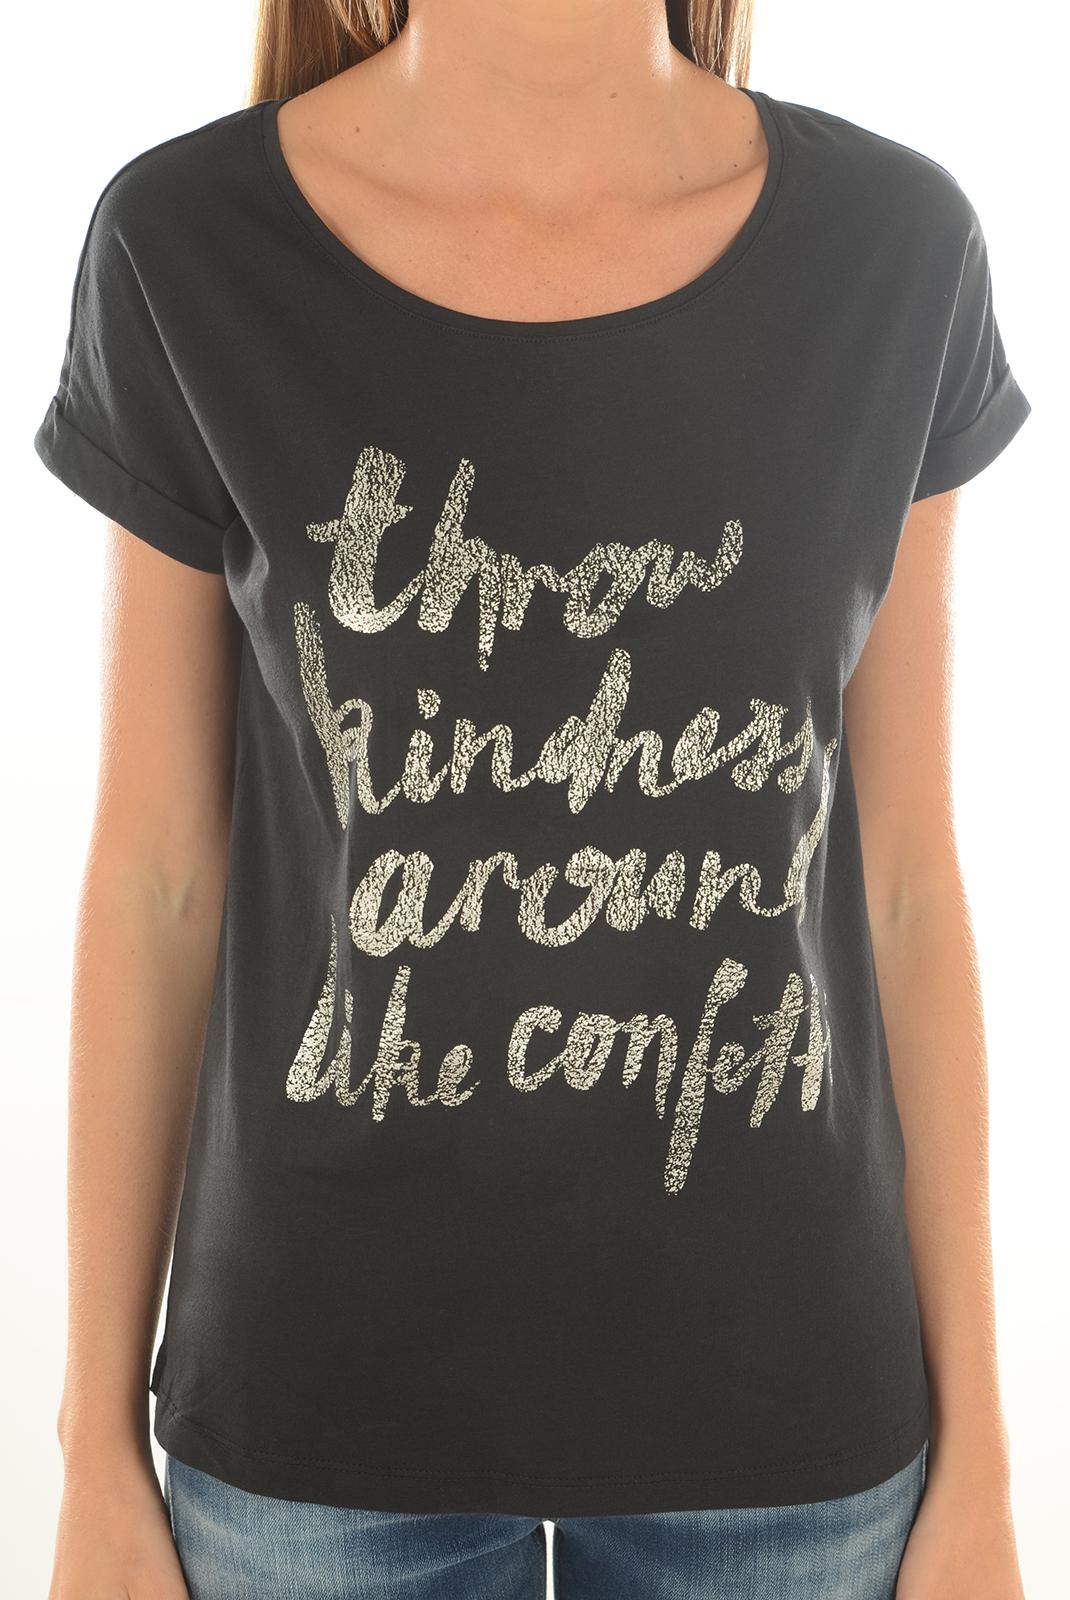 Tops & Tee shirts  Vero moda GOTHIC S/S BLACK